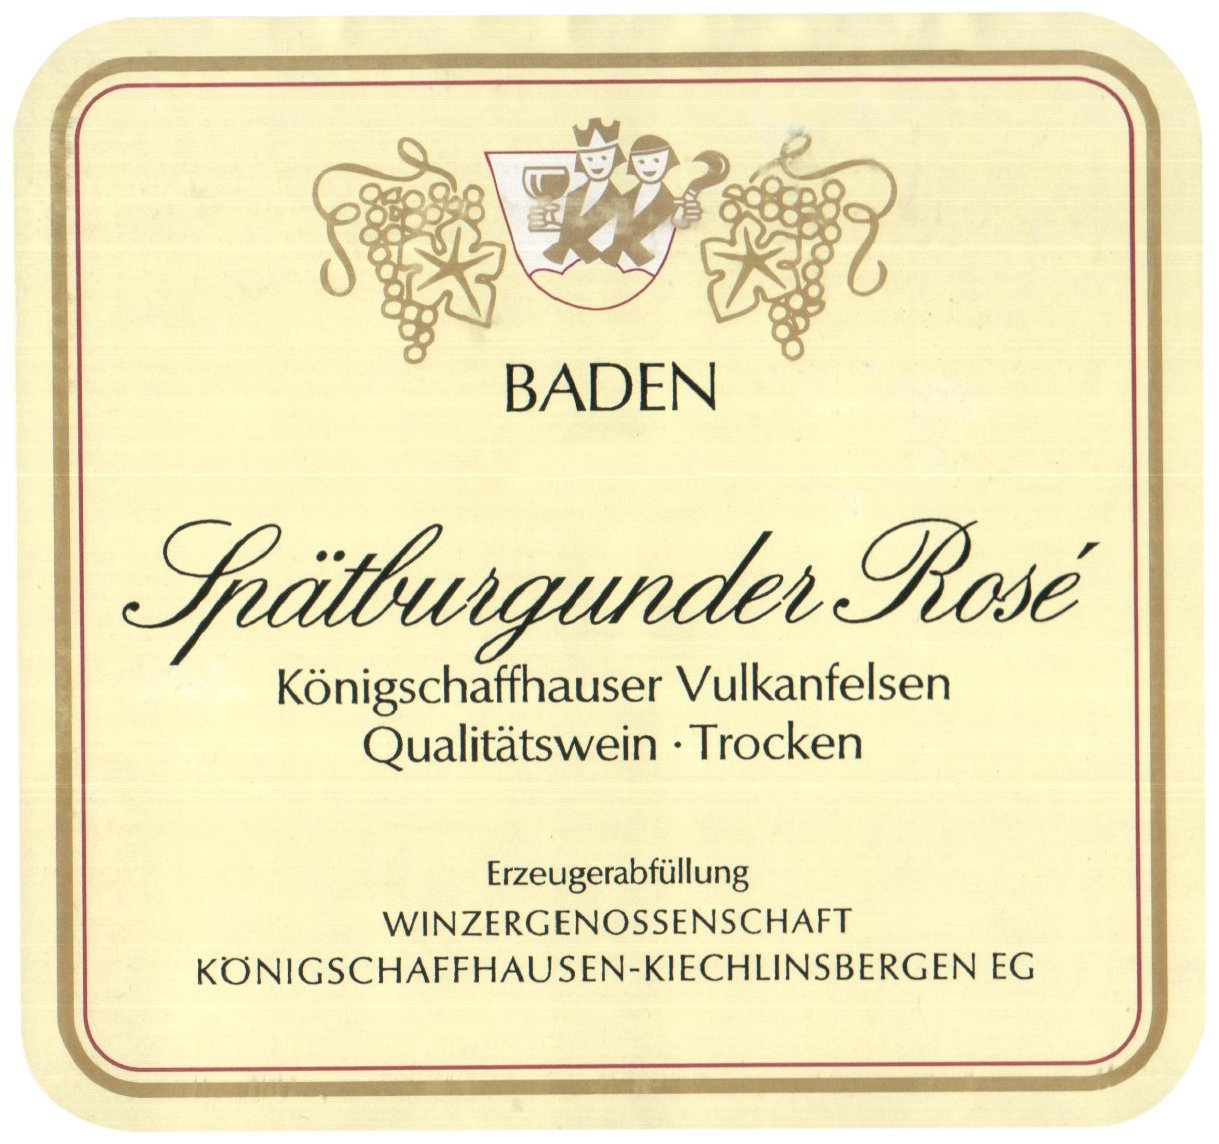 Winzergenossenschaft-Knigschaffhausen-Vulkanfelsen-Sptburgunder-Ros-2017-6-x-075-l